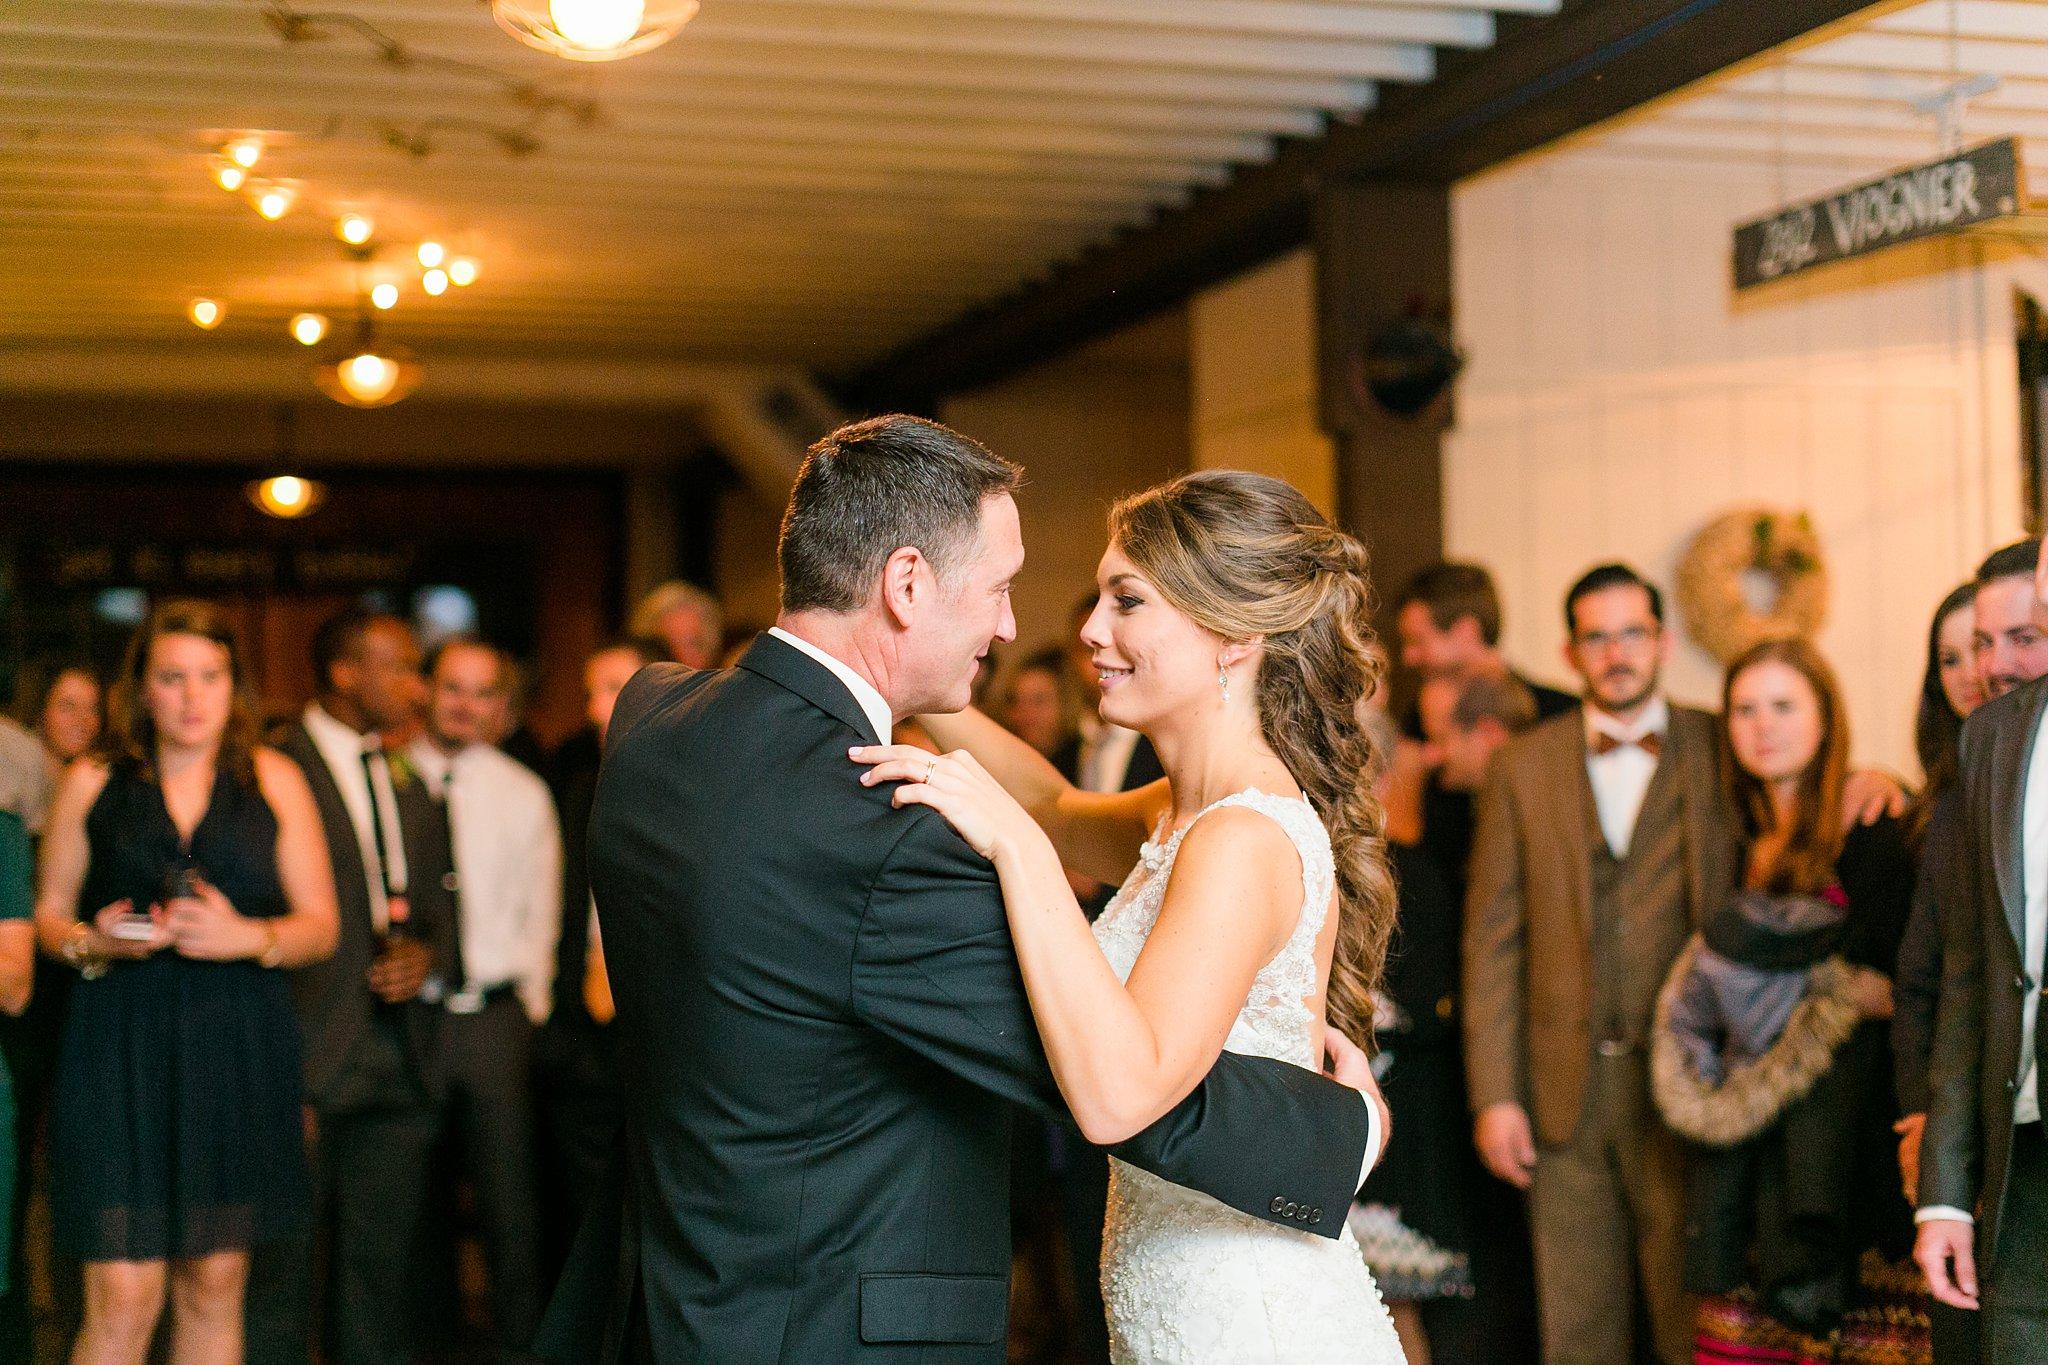 Stone Tower Winery Wedding Photos Virginia Wedding Photographer Megan Kelsey Photography Sam & Angela-274.jpg